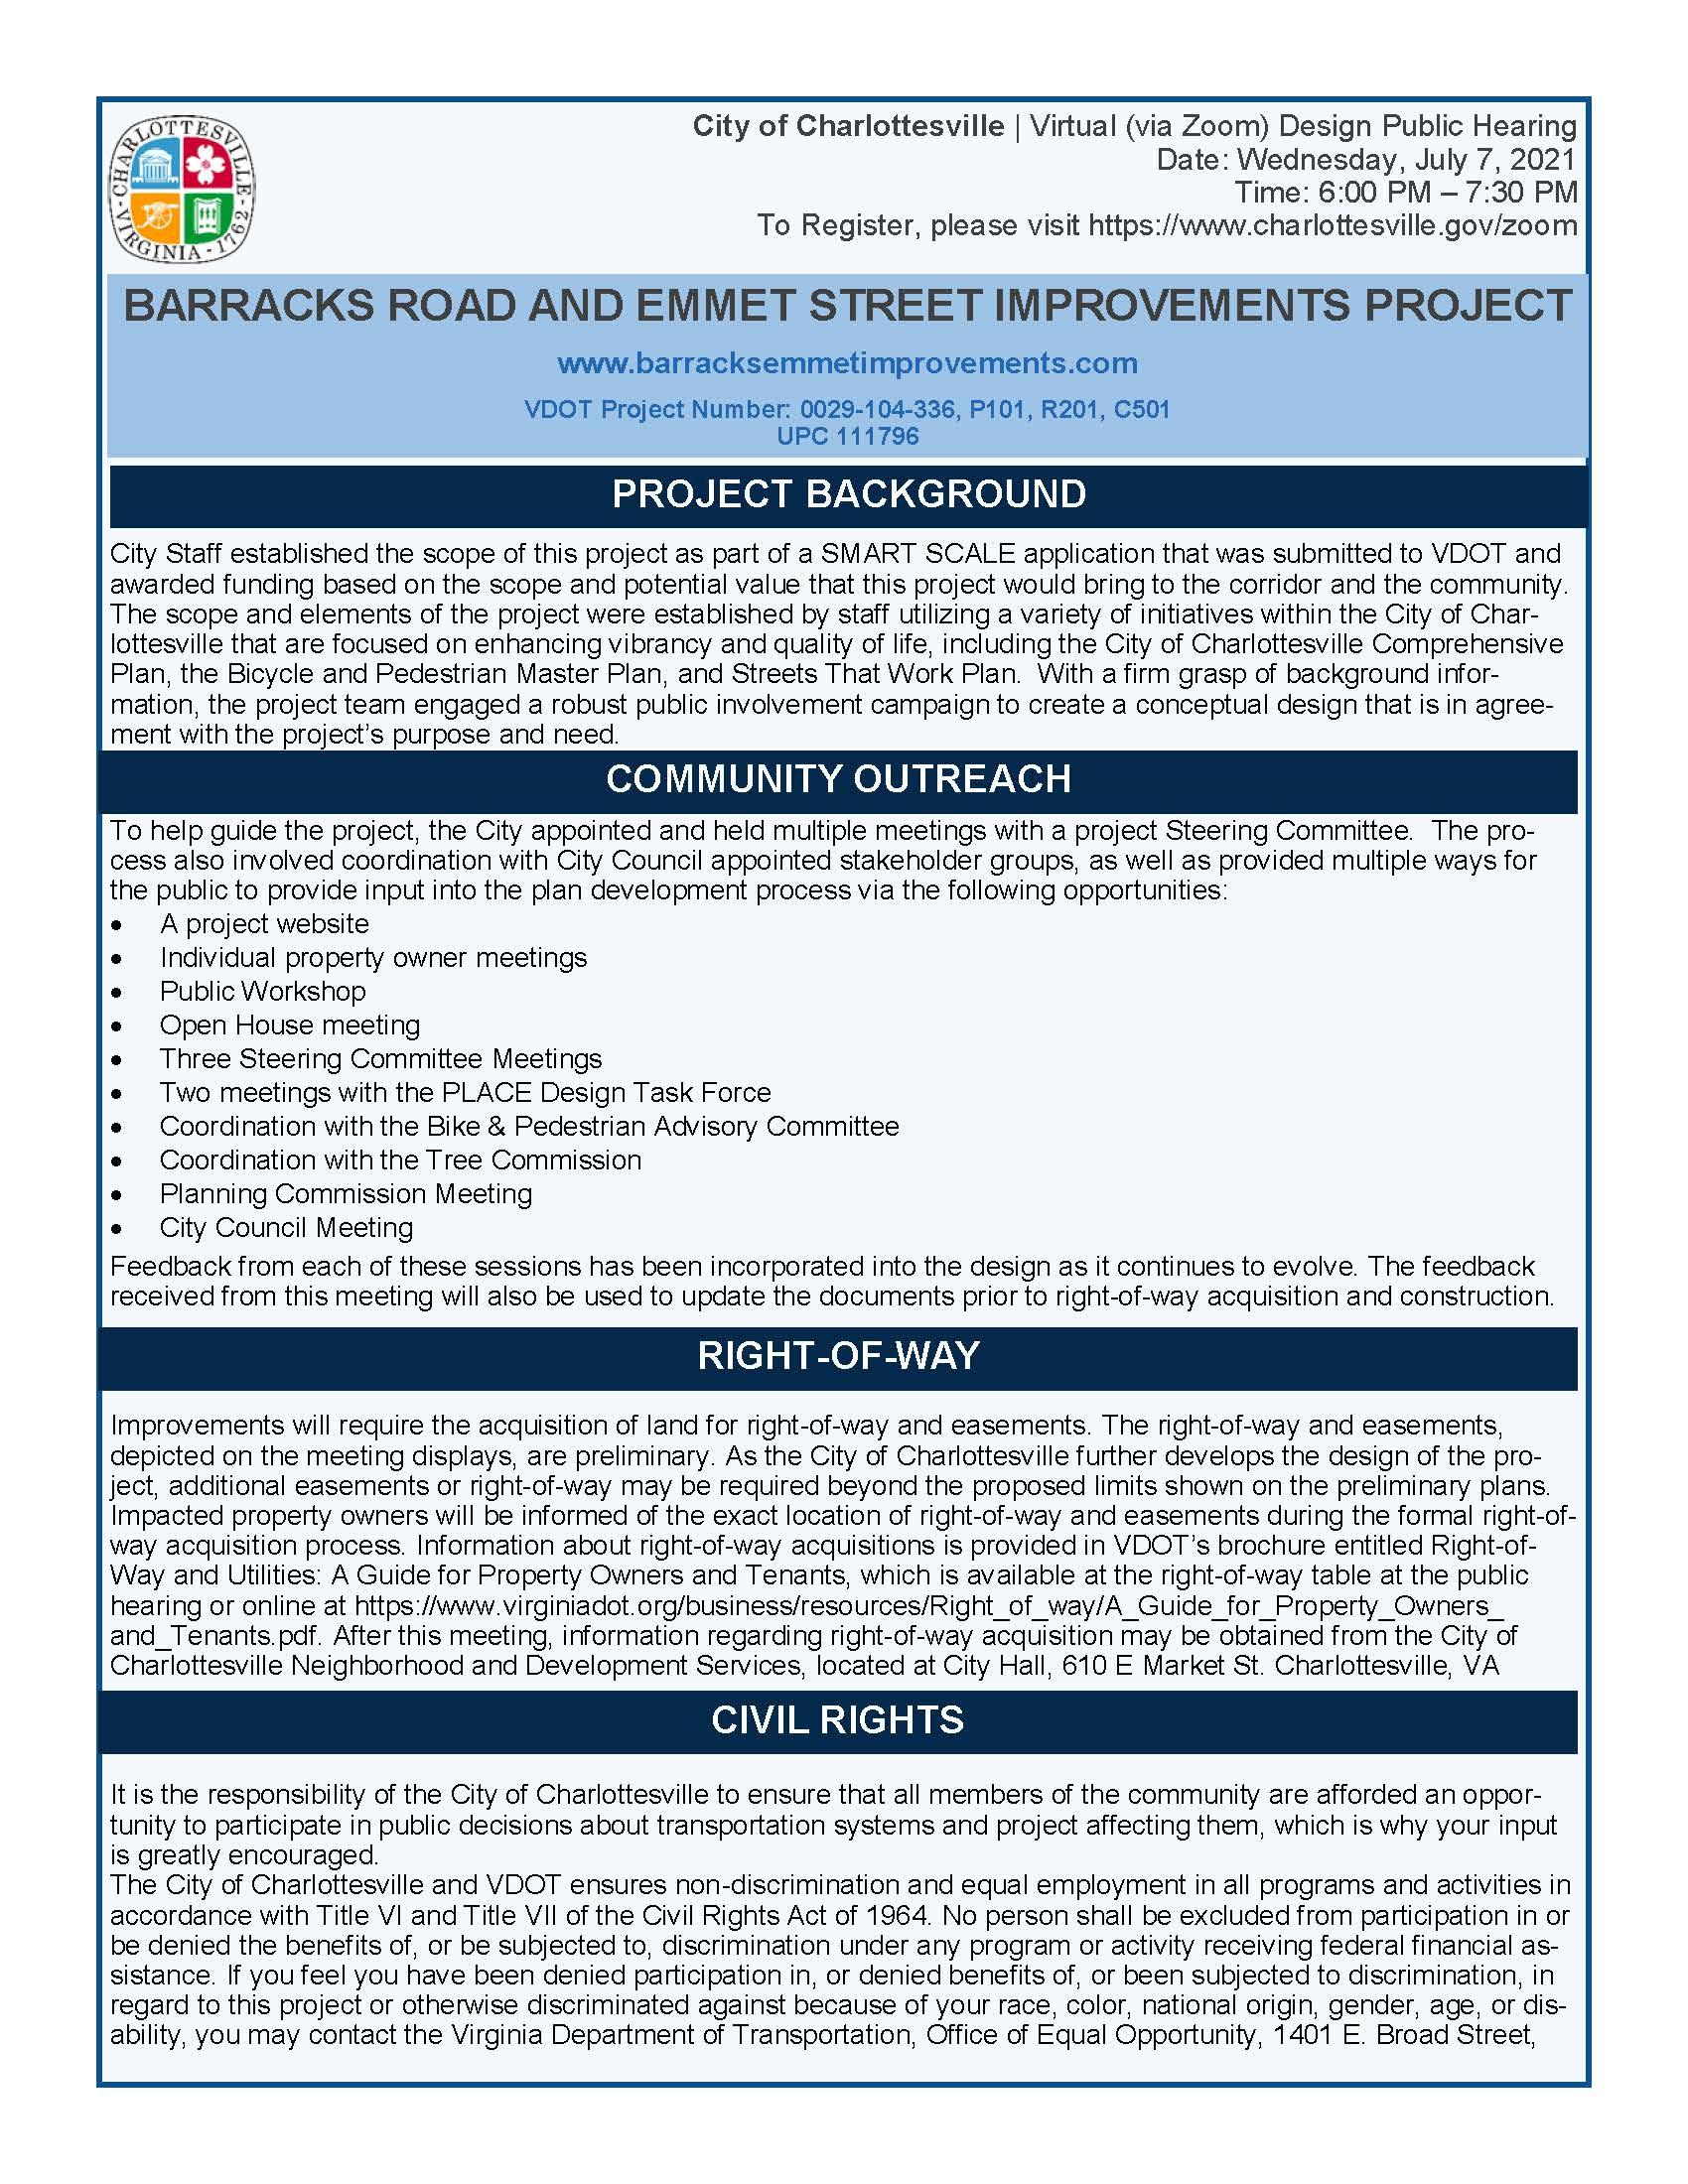 Barracks-Emmet Public Hearing Brochure_Page_2